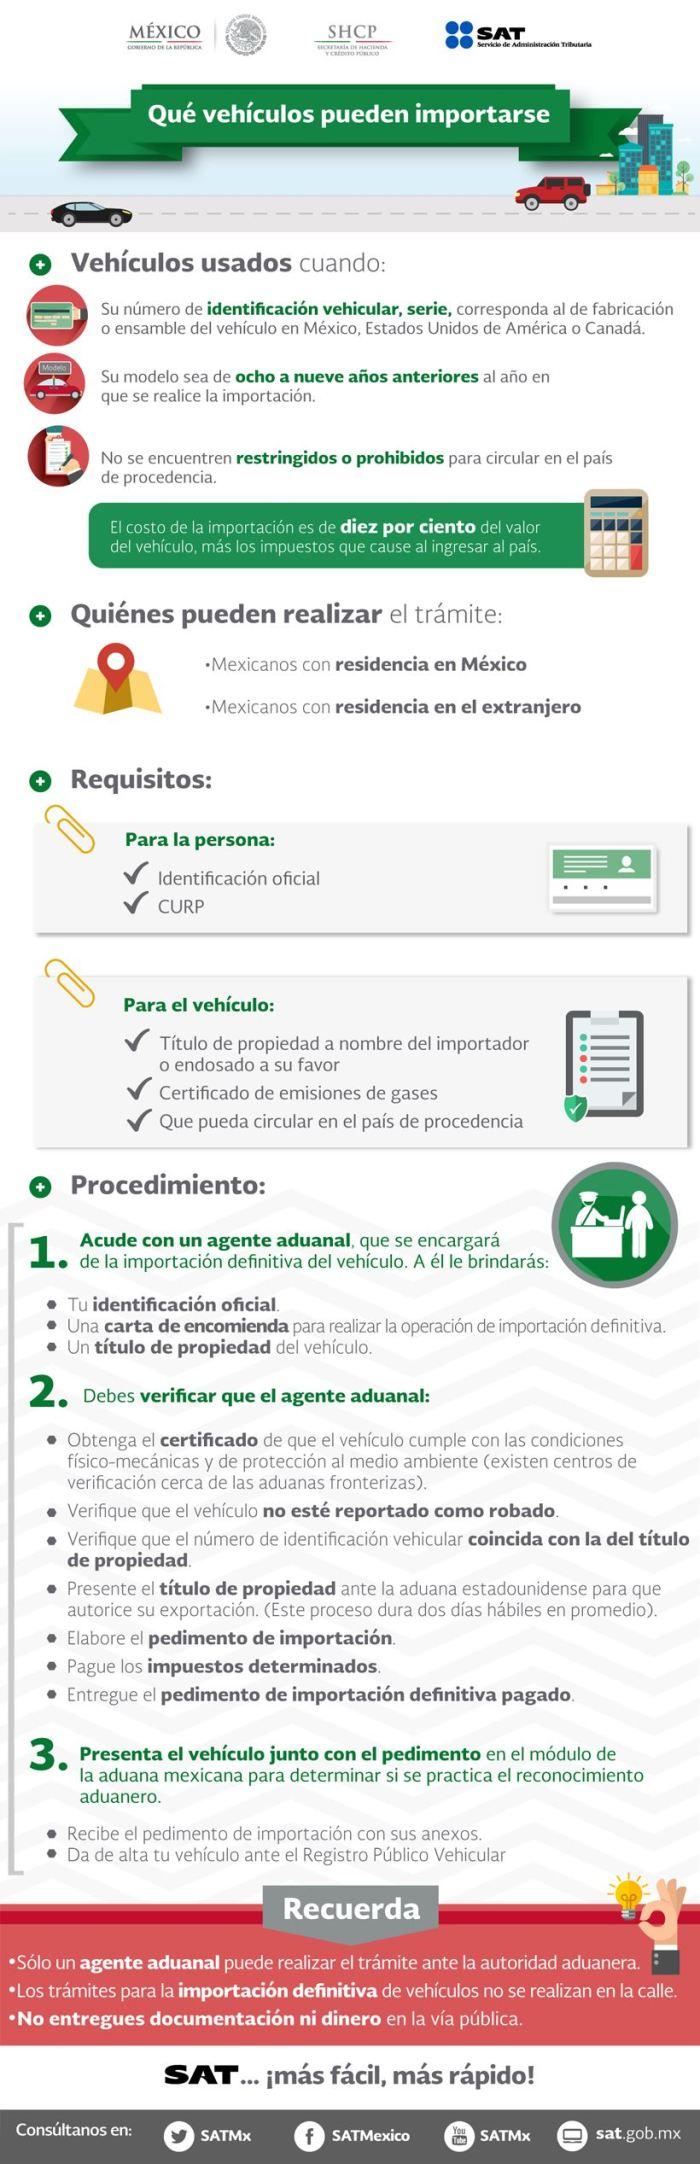 infografia_importancion_definitiva